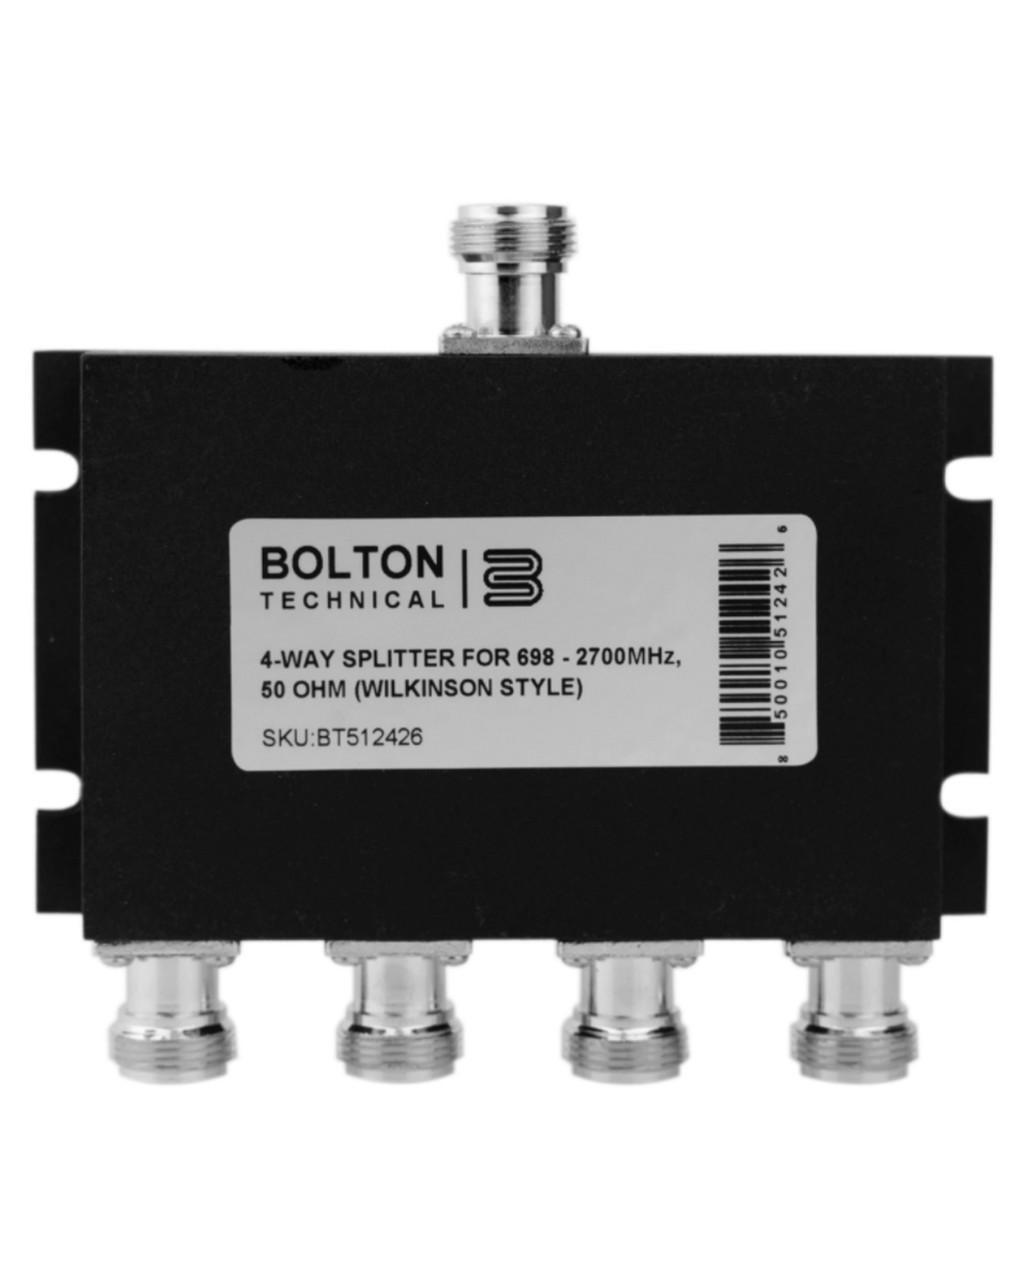 4-Way Splitter for 689-2700 MHz Wilkinson Style 50 Ohm